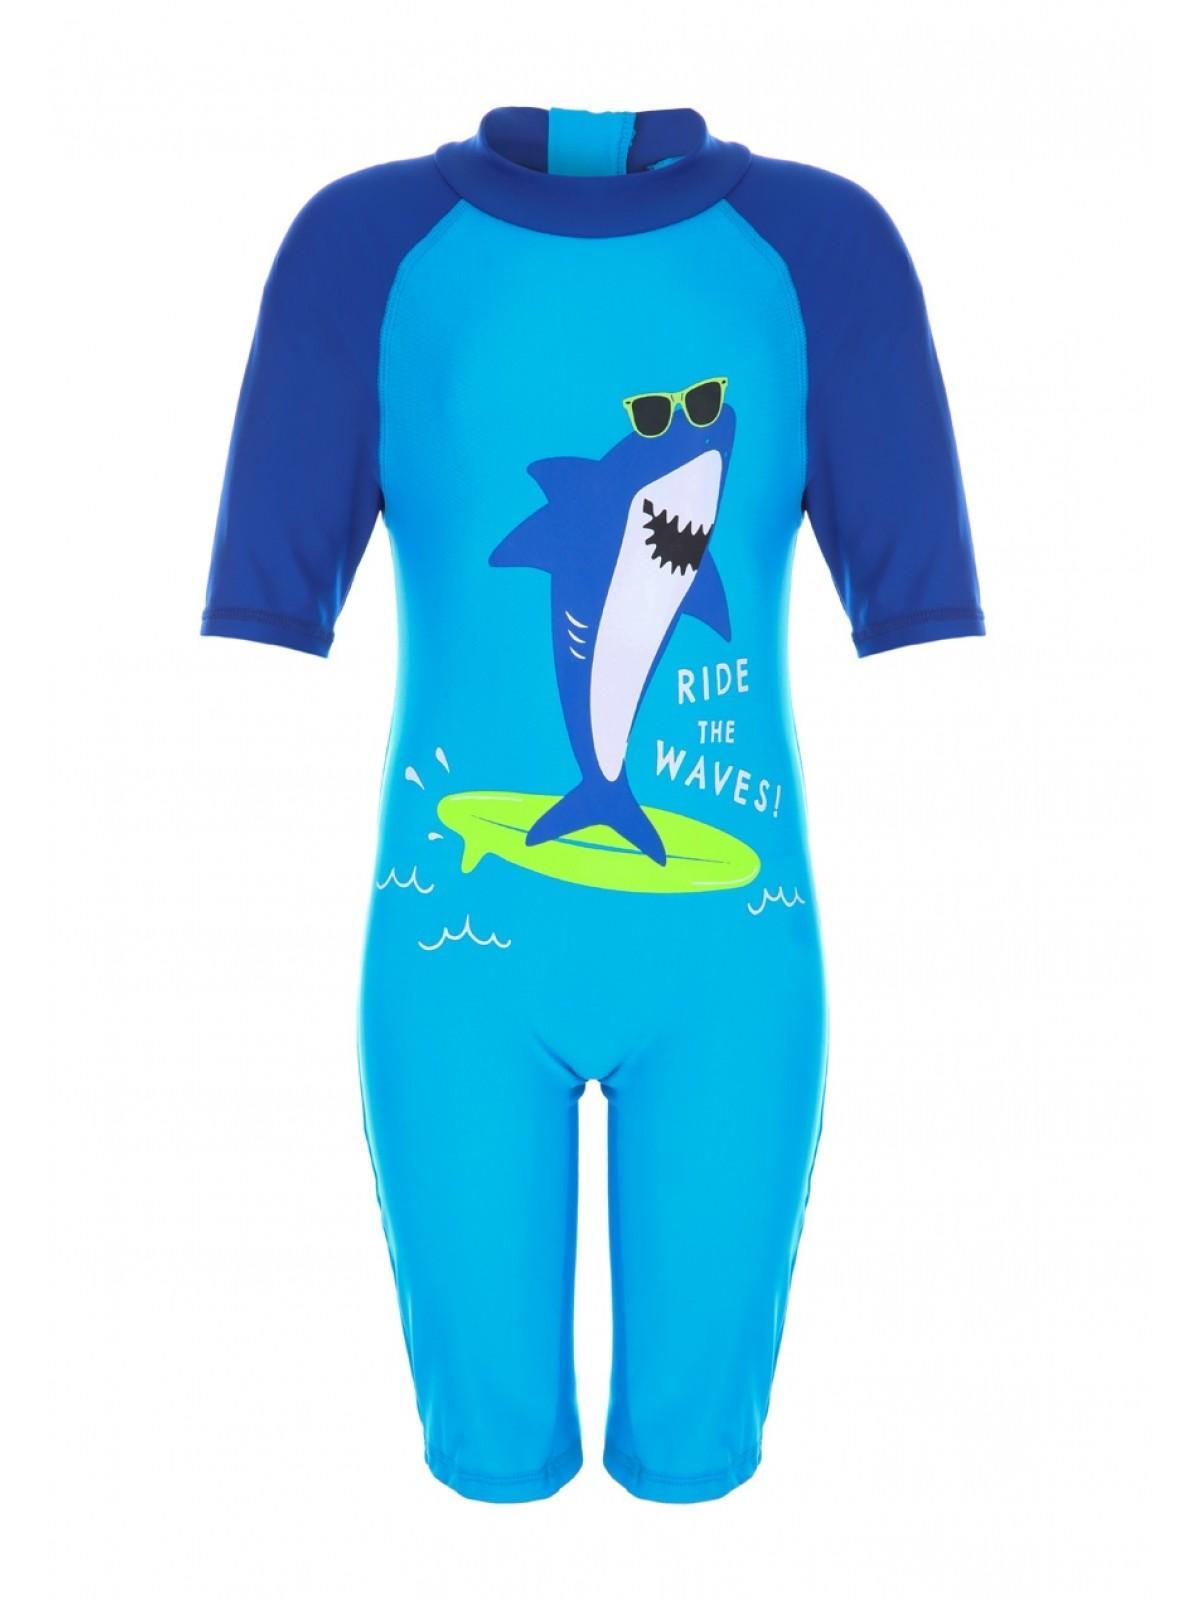 6592a612254d0 Home; Younger Boys Blue Shark Sun Safe Swimsuit. Back. PreviousNext